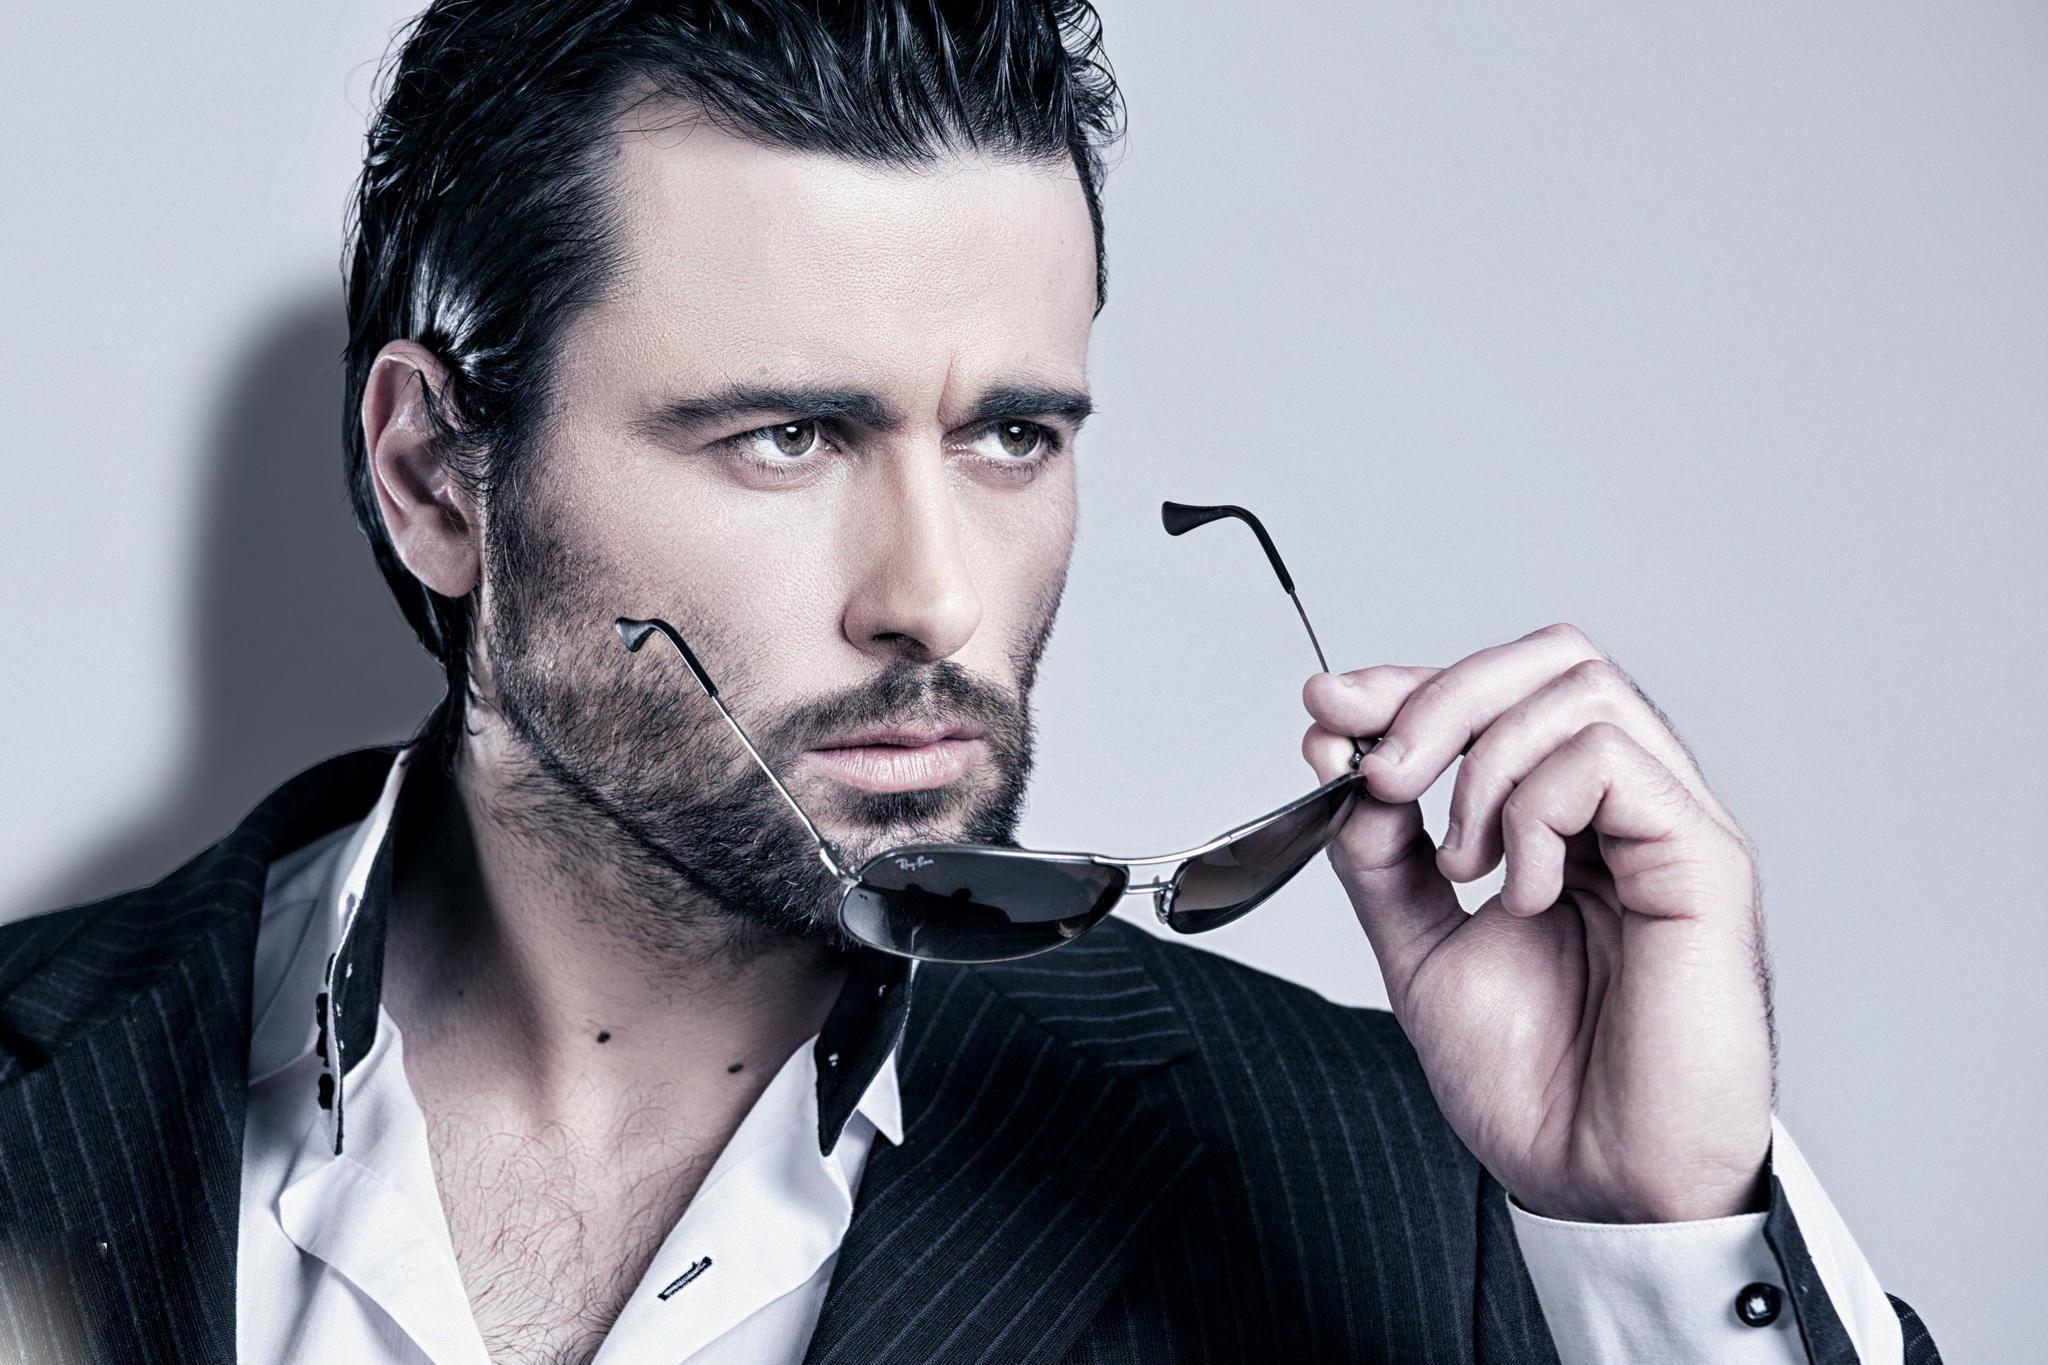 man-photography-fashion-style-beard-yay-ban-gentleman-wallapaper-hd-6156637